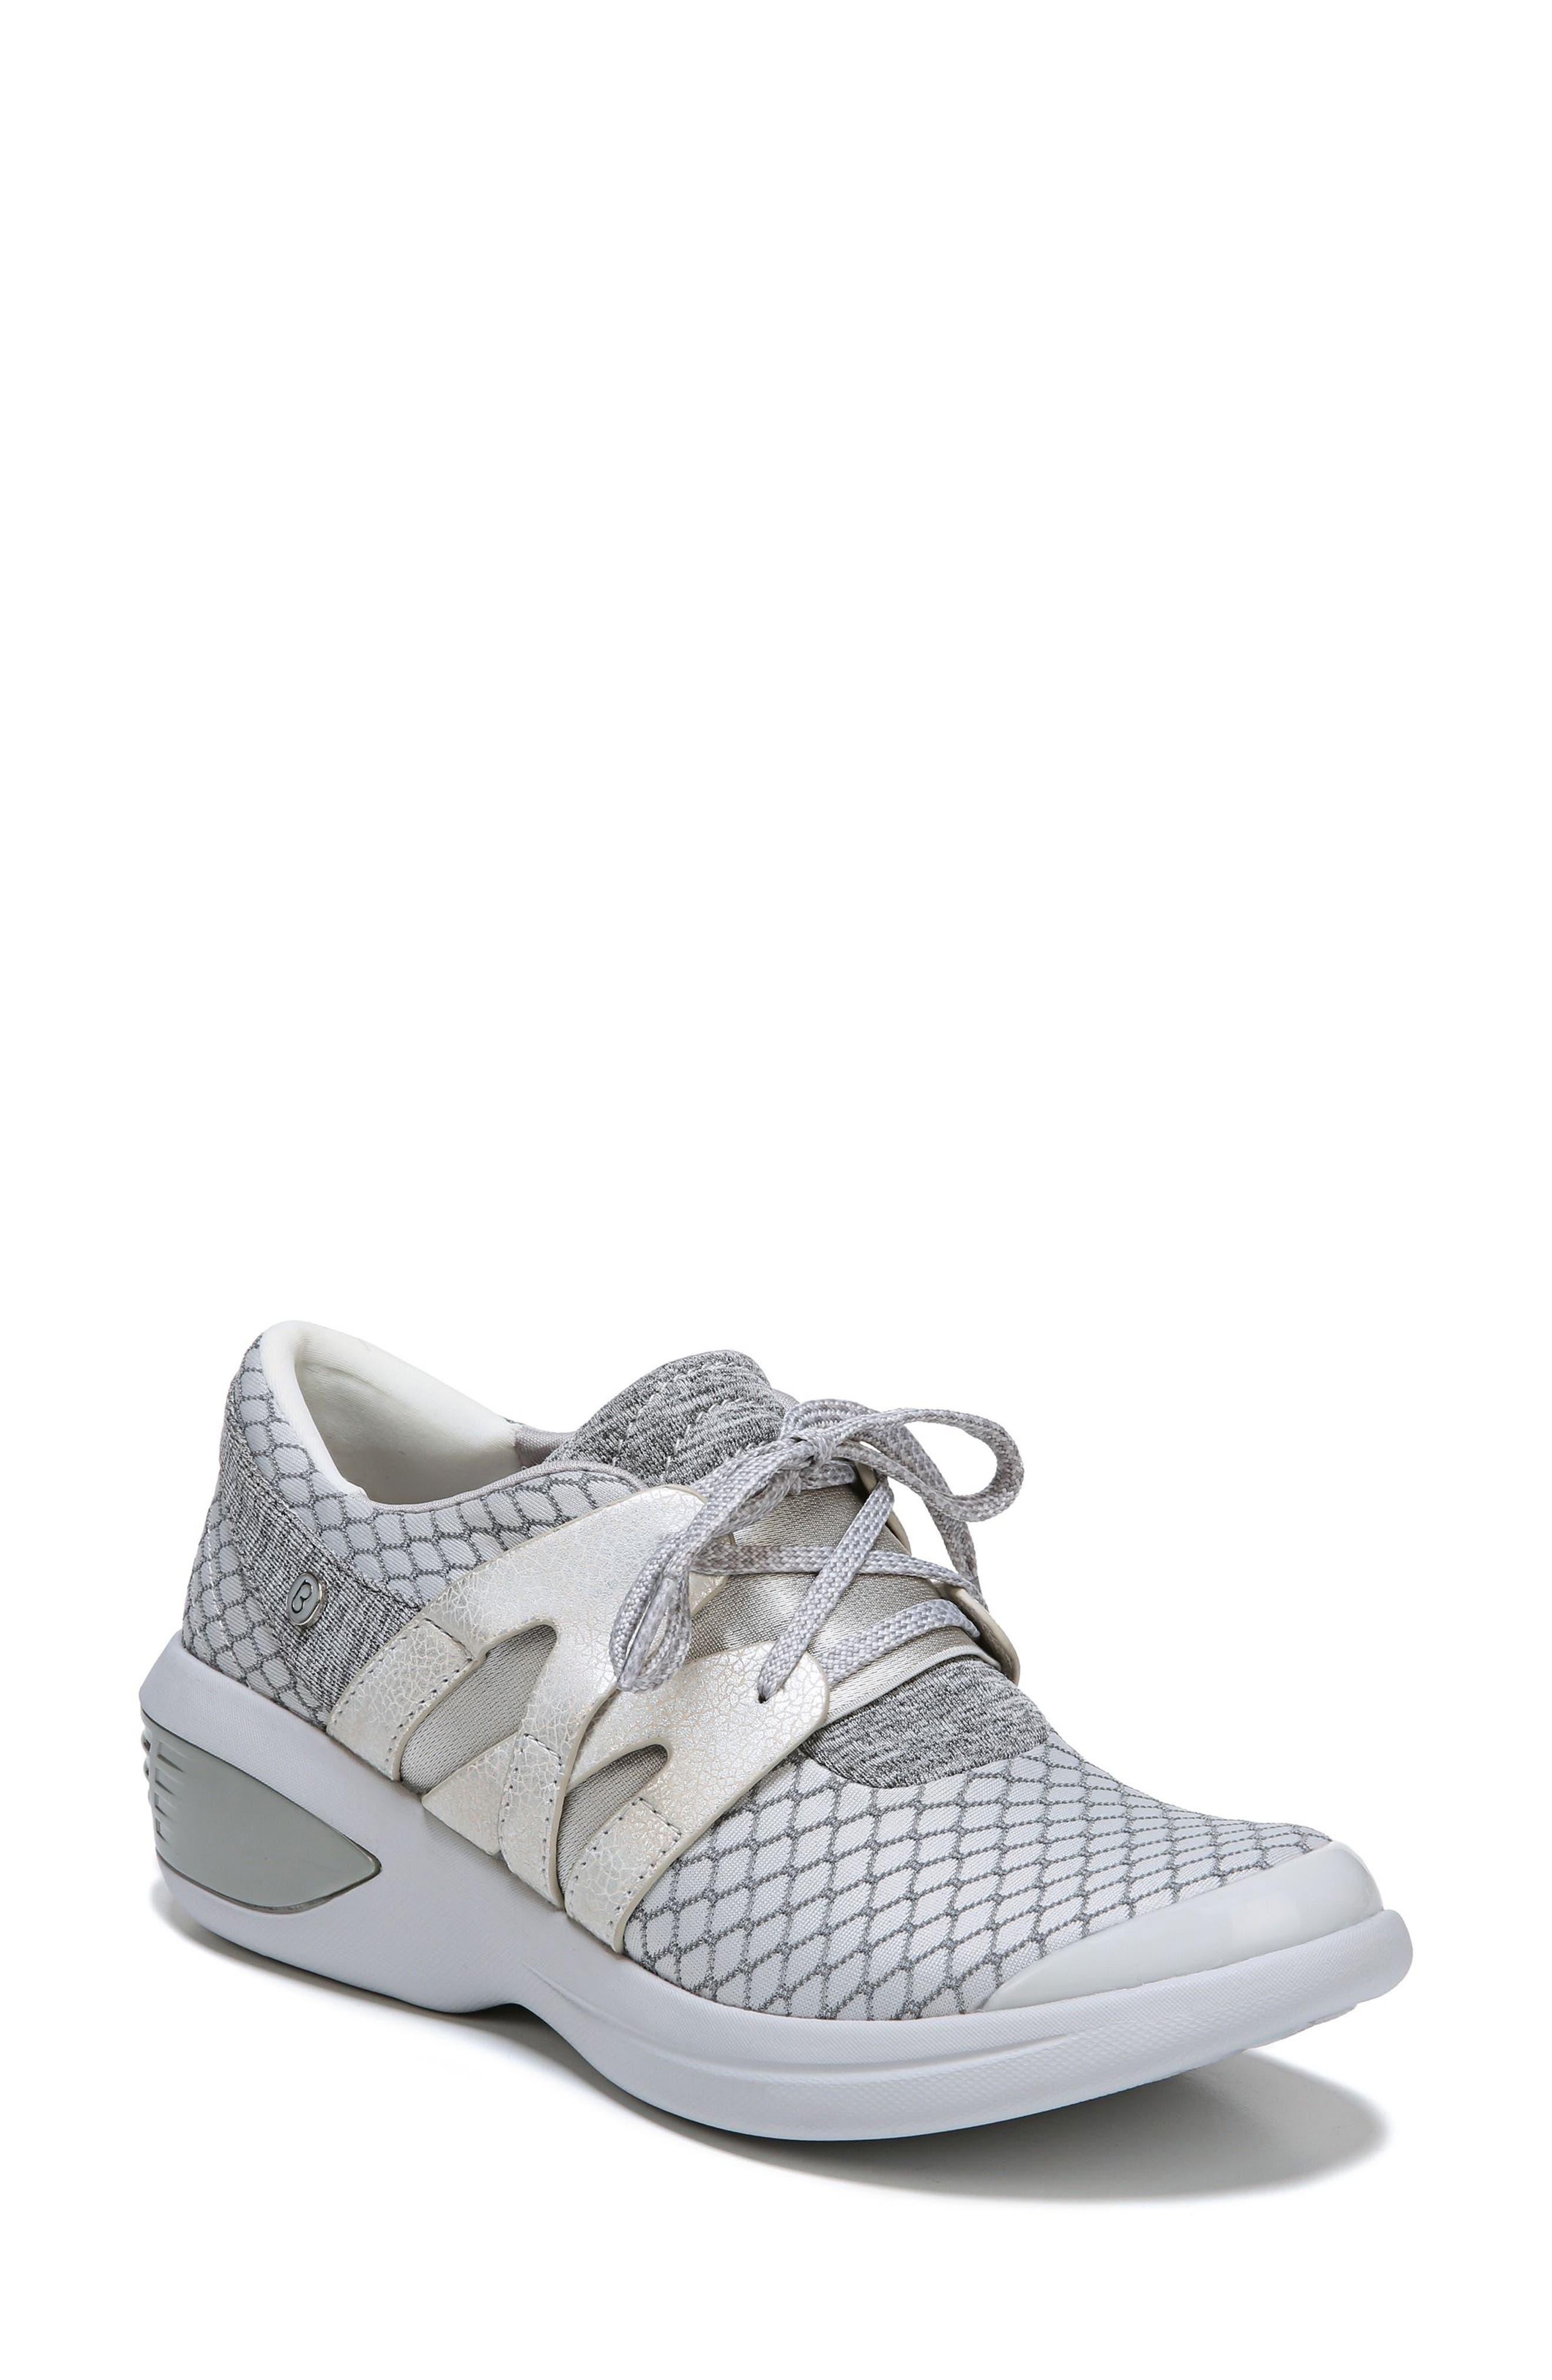 Flicker Sneaker,                             Main thumbnail 1, color,                             020